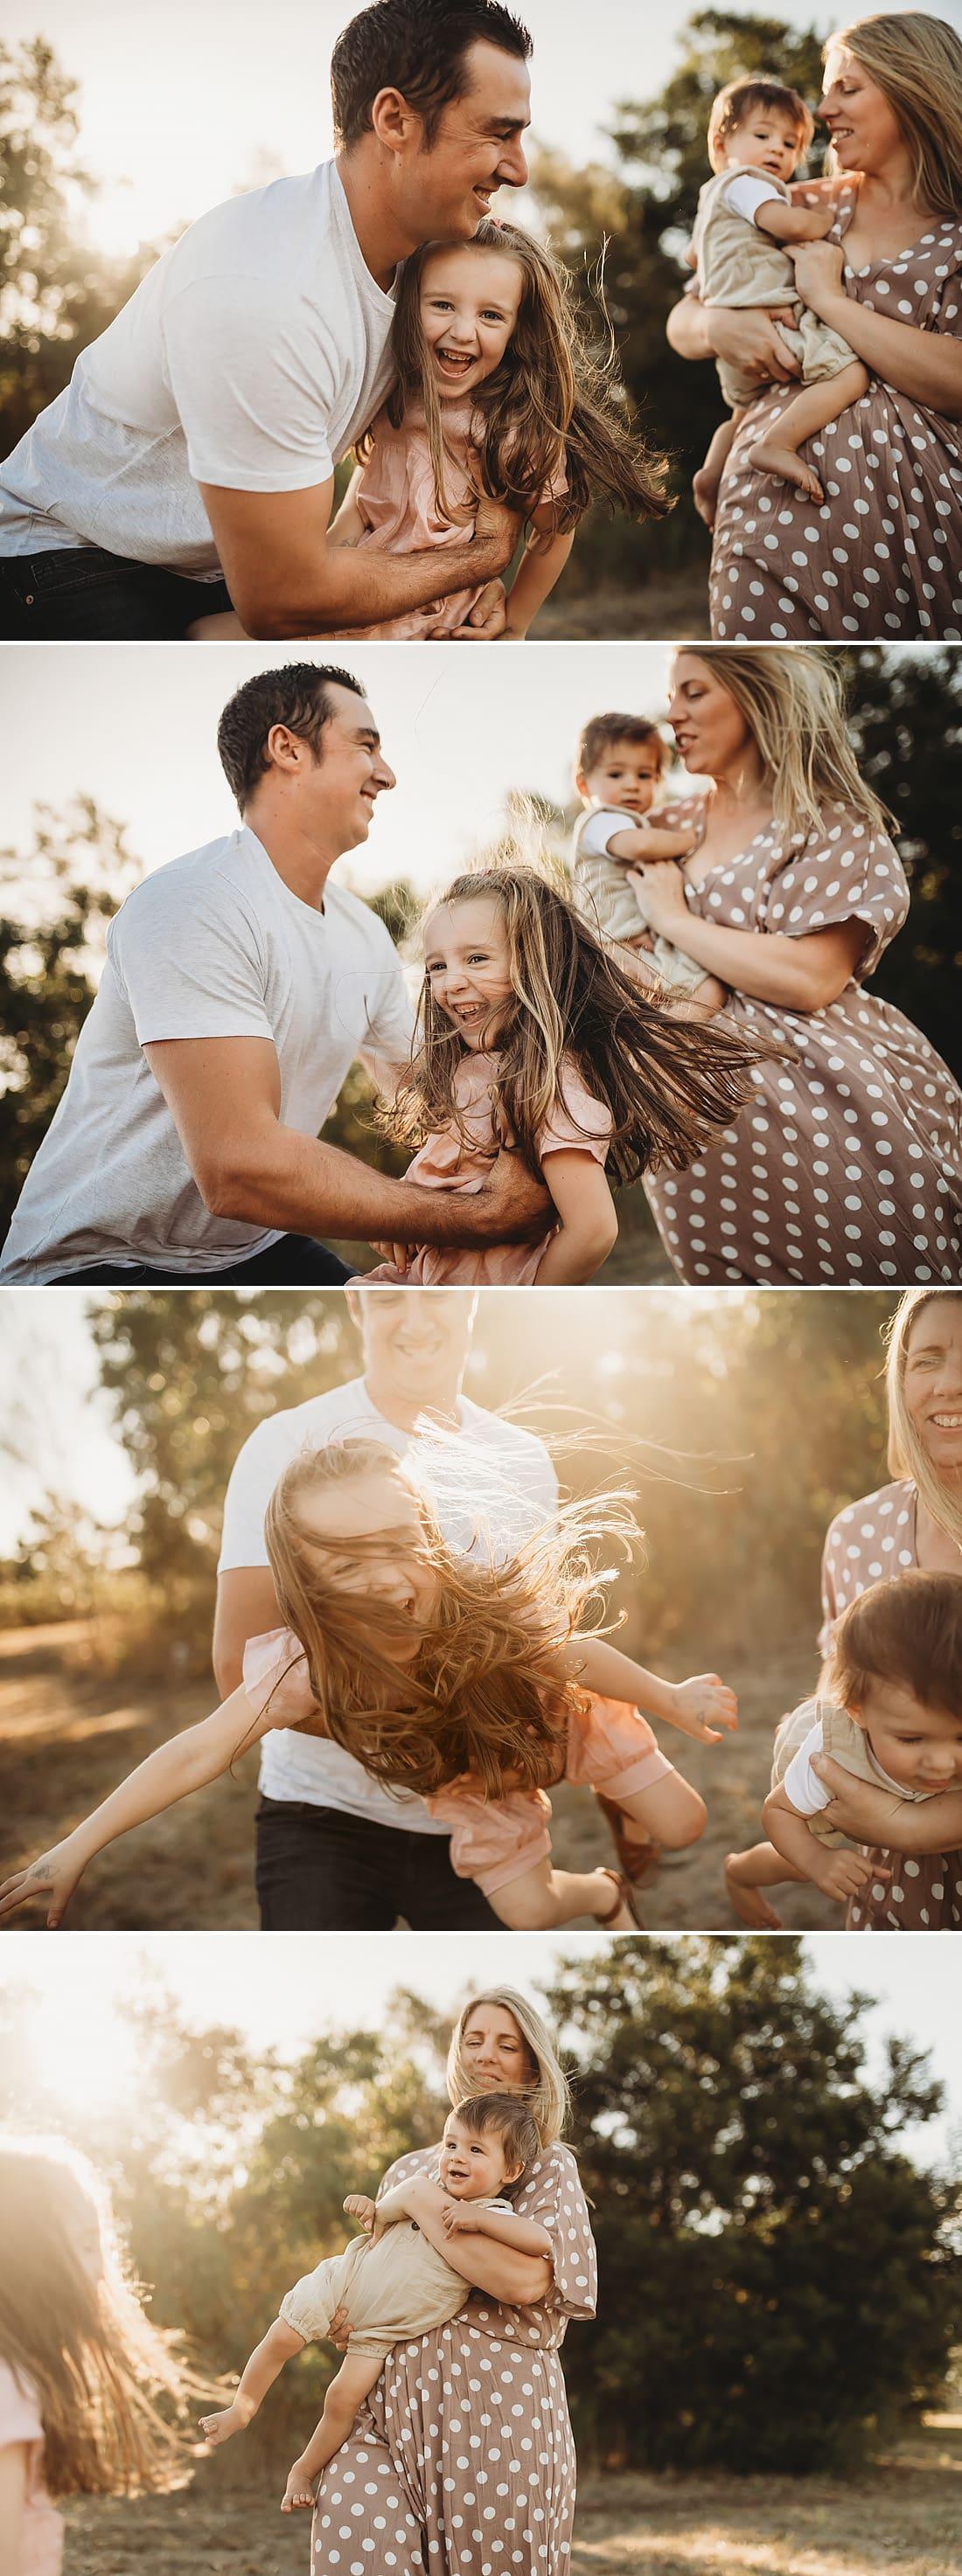 Family-Lifestyle-Photography-Workshop-Australia